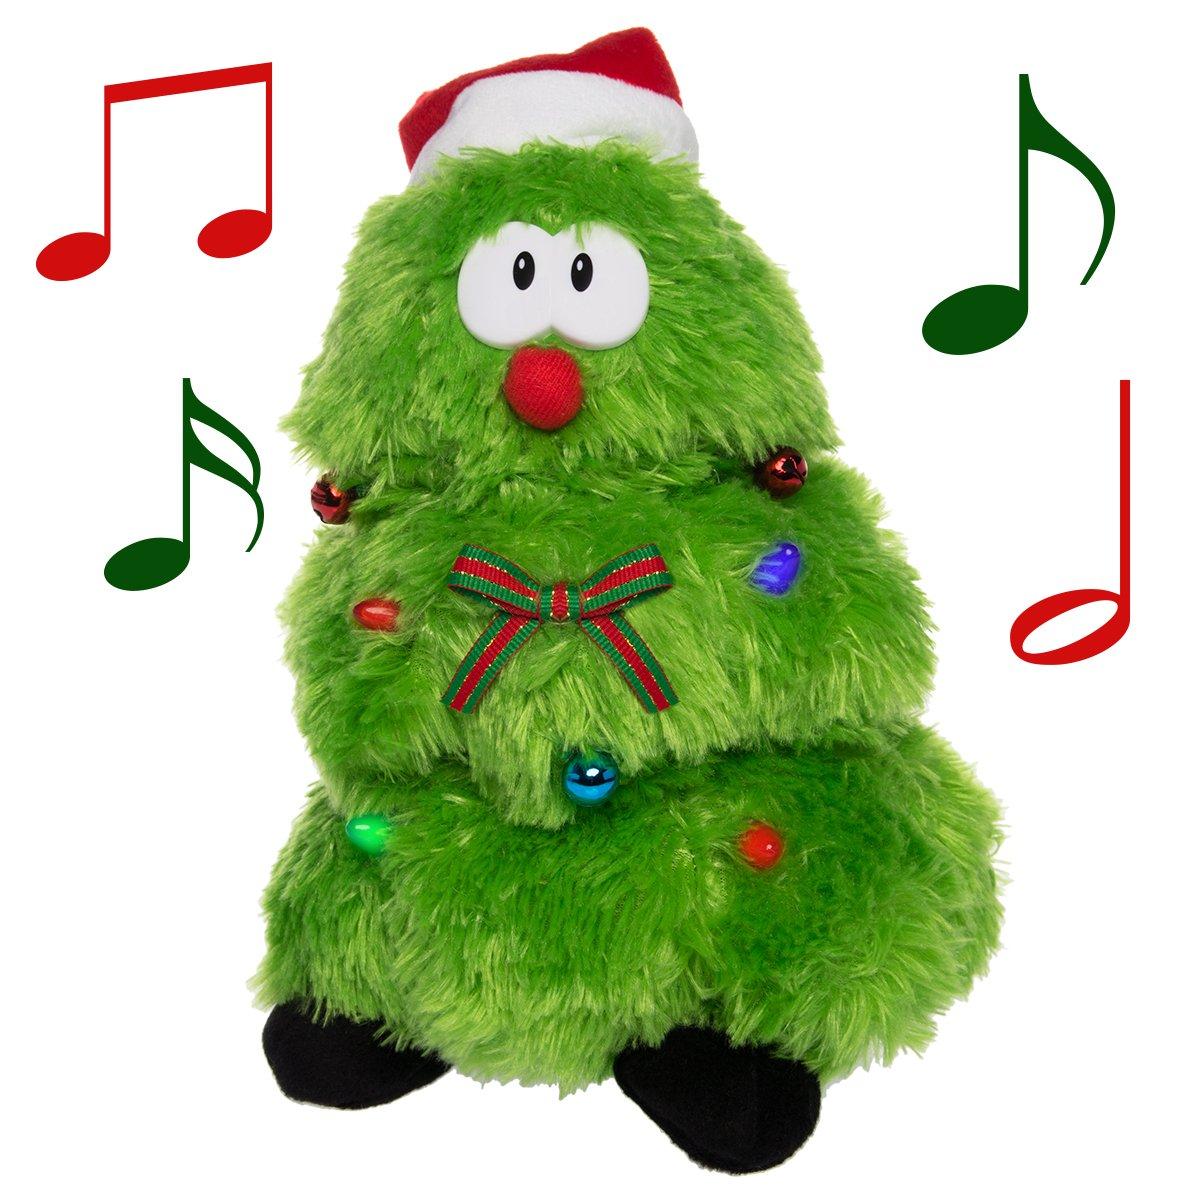 Simply Genius Plush Animated Stuffed Animal Toy Singing Dancing Light Up Figure (Singing & Dancing Christmas Tree) by Simply Genius